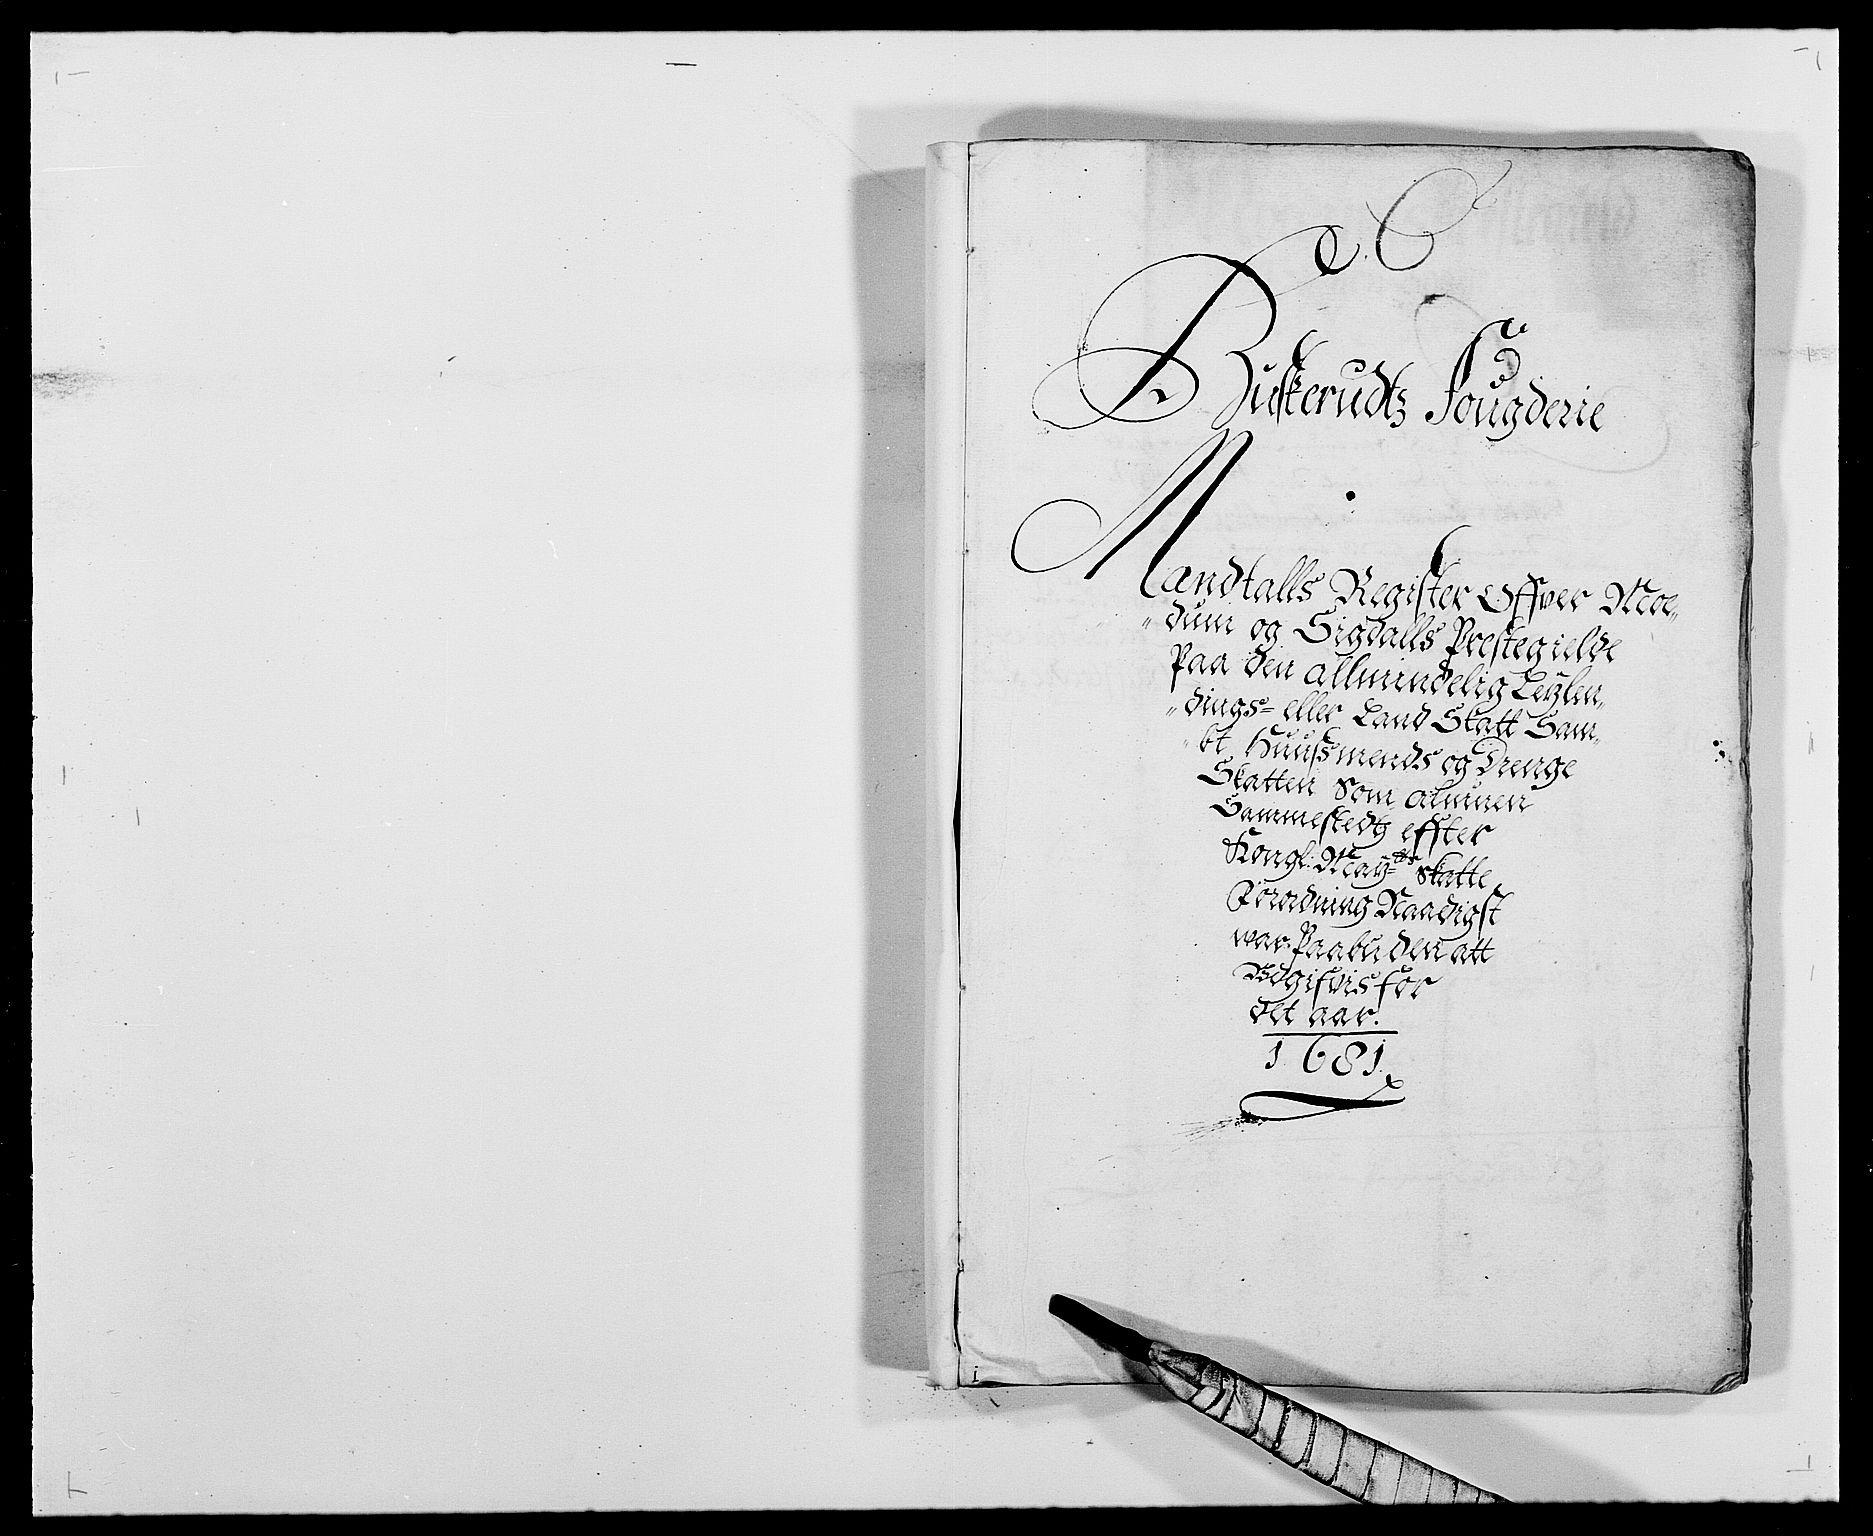 RA, Rentekammeret inntil 1814, Reviderte regnskaper, Fogderegnskap, R25/L1675: Fogderegnskap Buskerud, 1678-1681, s. 224